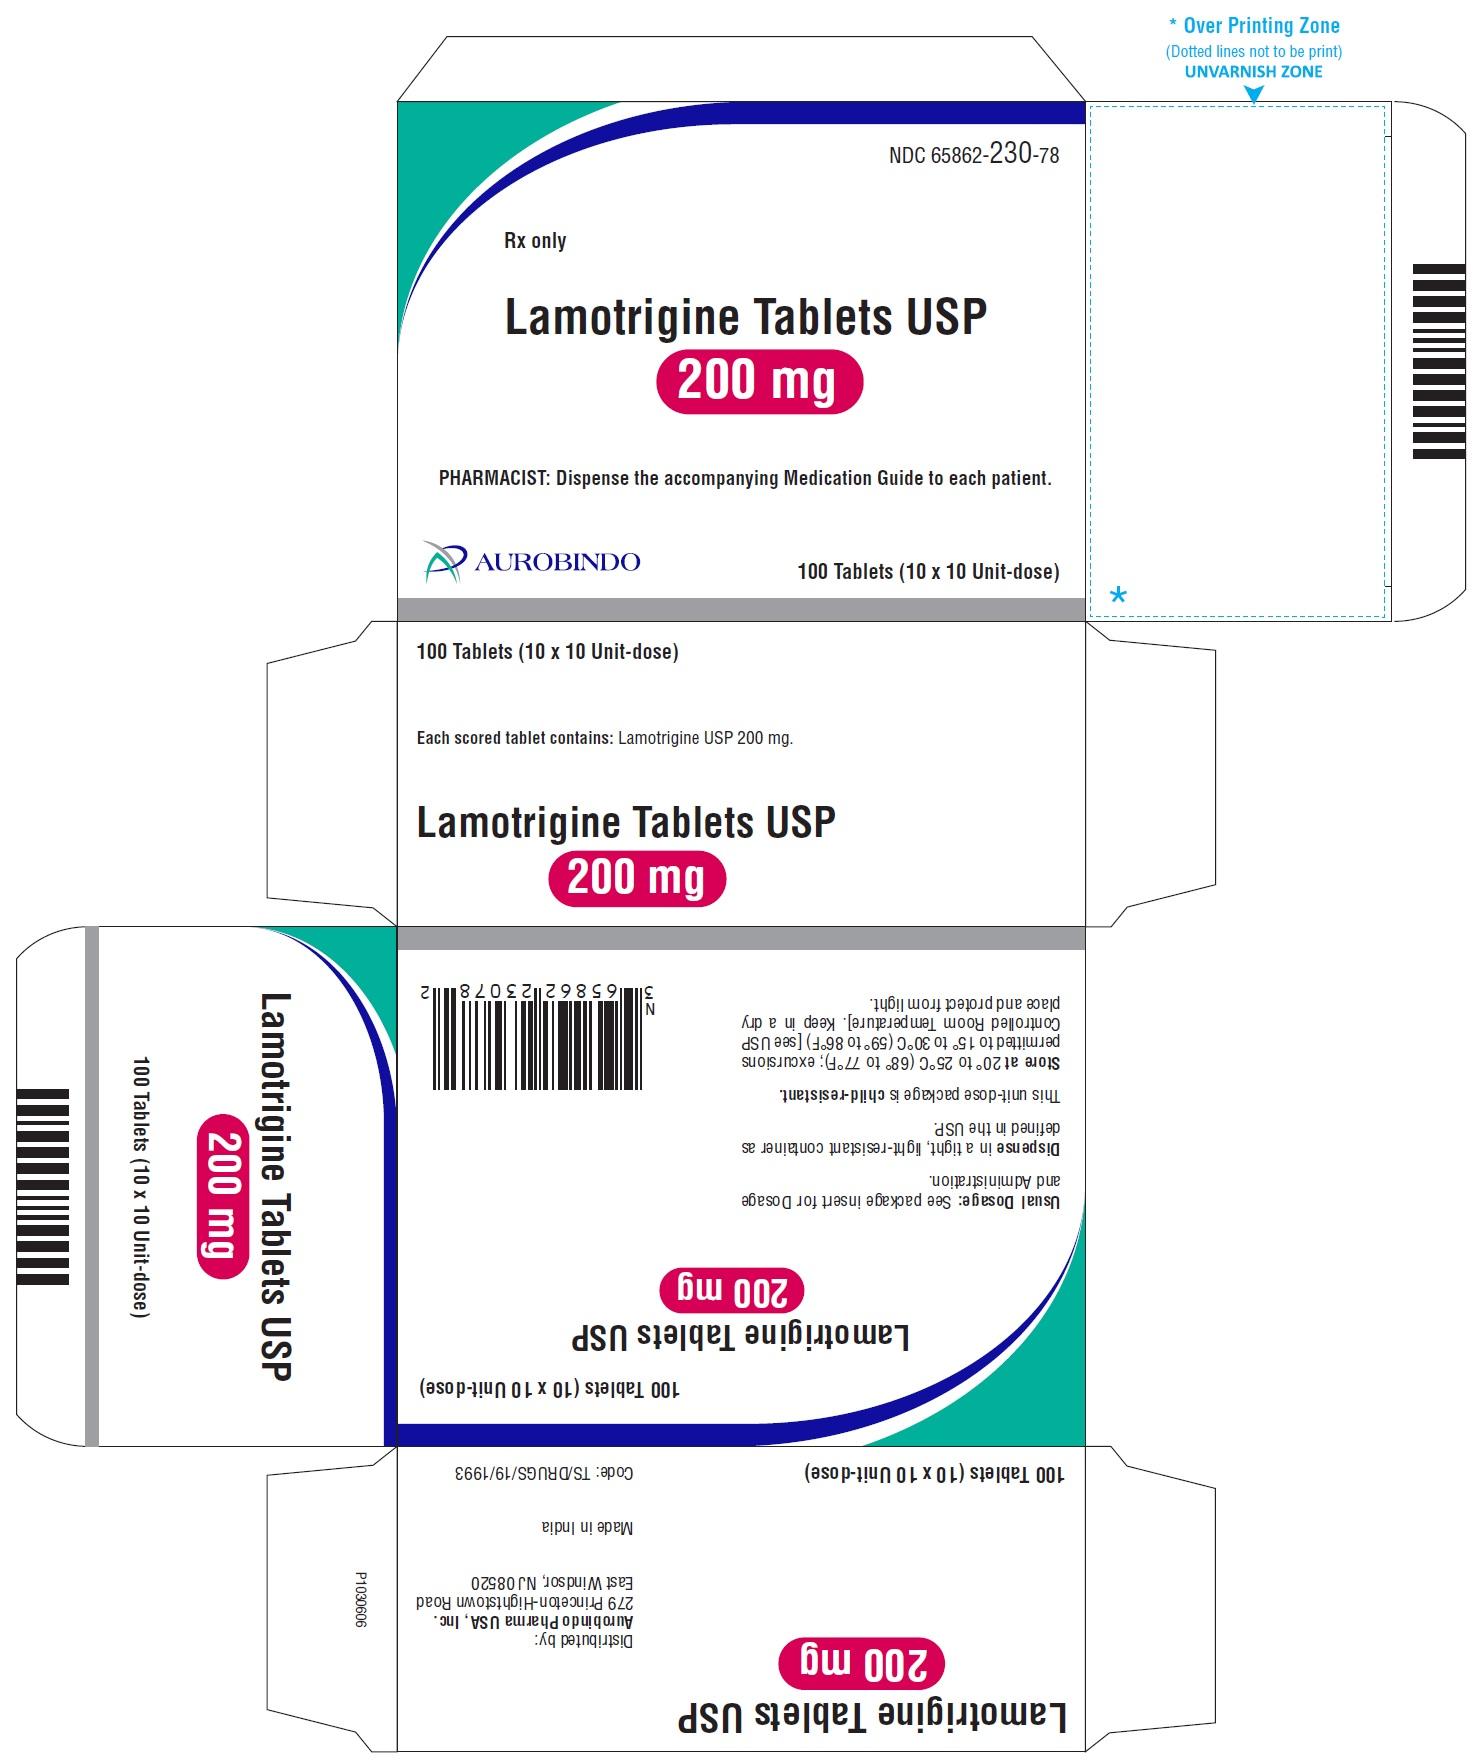 PACKAGE LABEL-PRINCIPAL DISPLAY PANEL - 200 mg Blister Carton (10 x 10 Unit-dose)